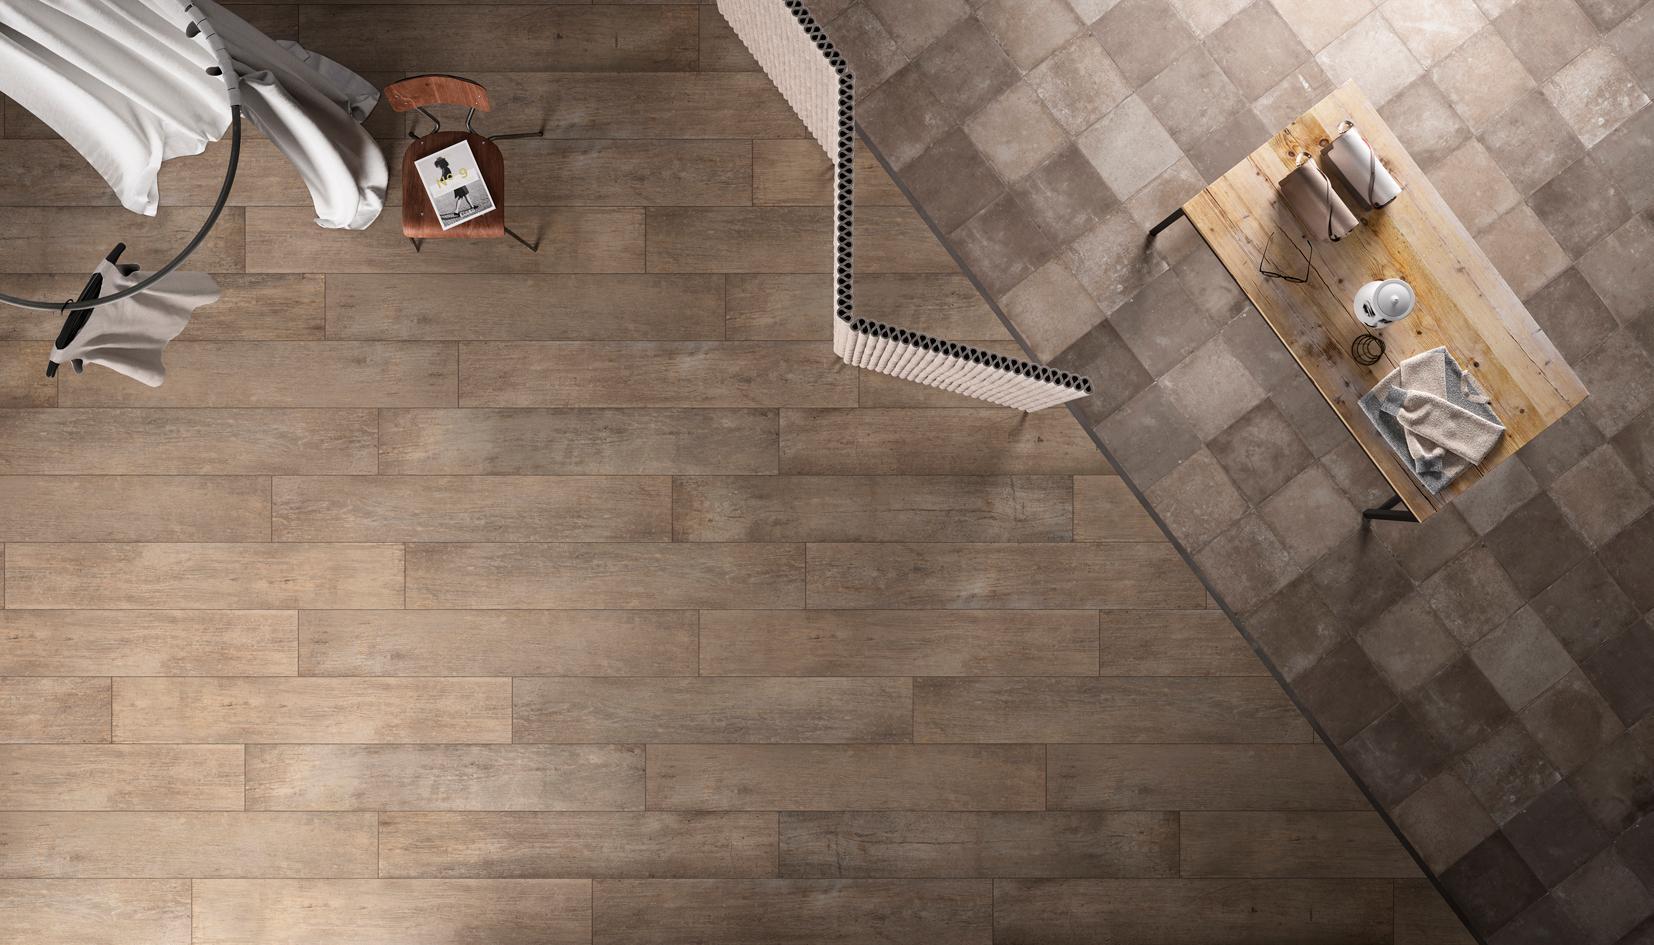 bodenbelag bilder ideen couchstyle. Black Bedroom Furniture Sets. Home Design Ideas